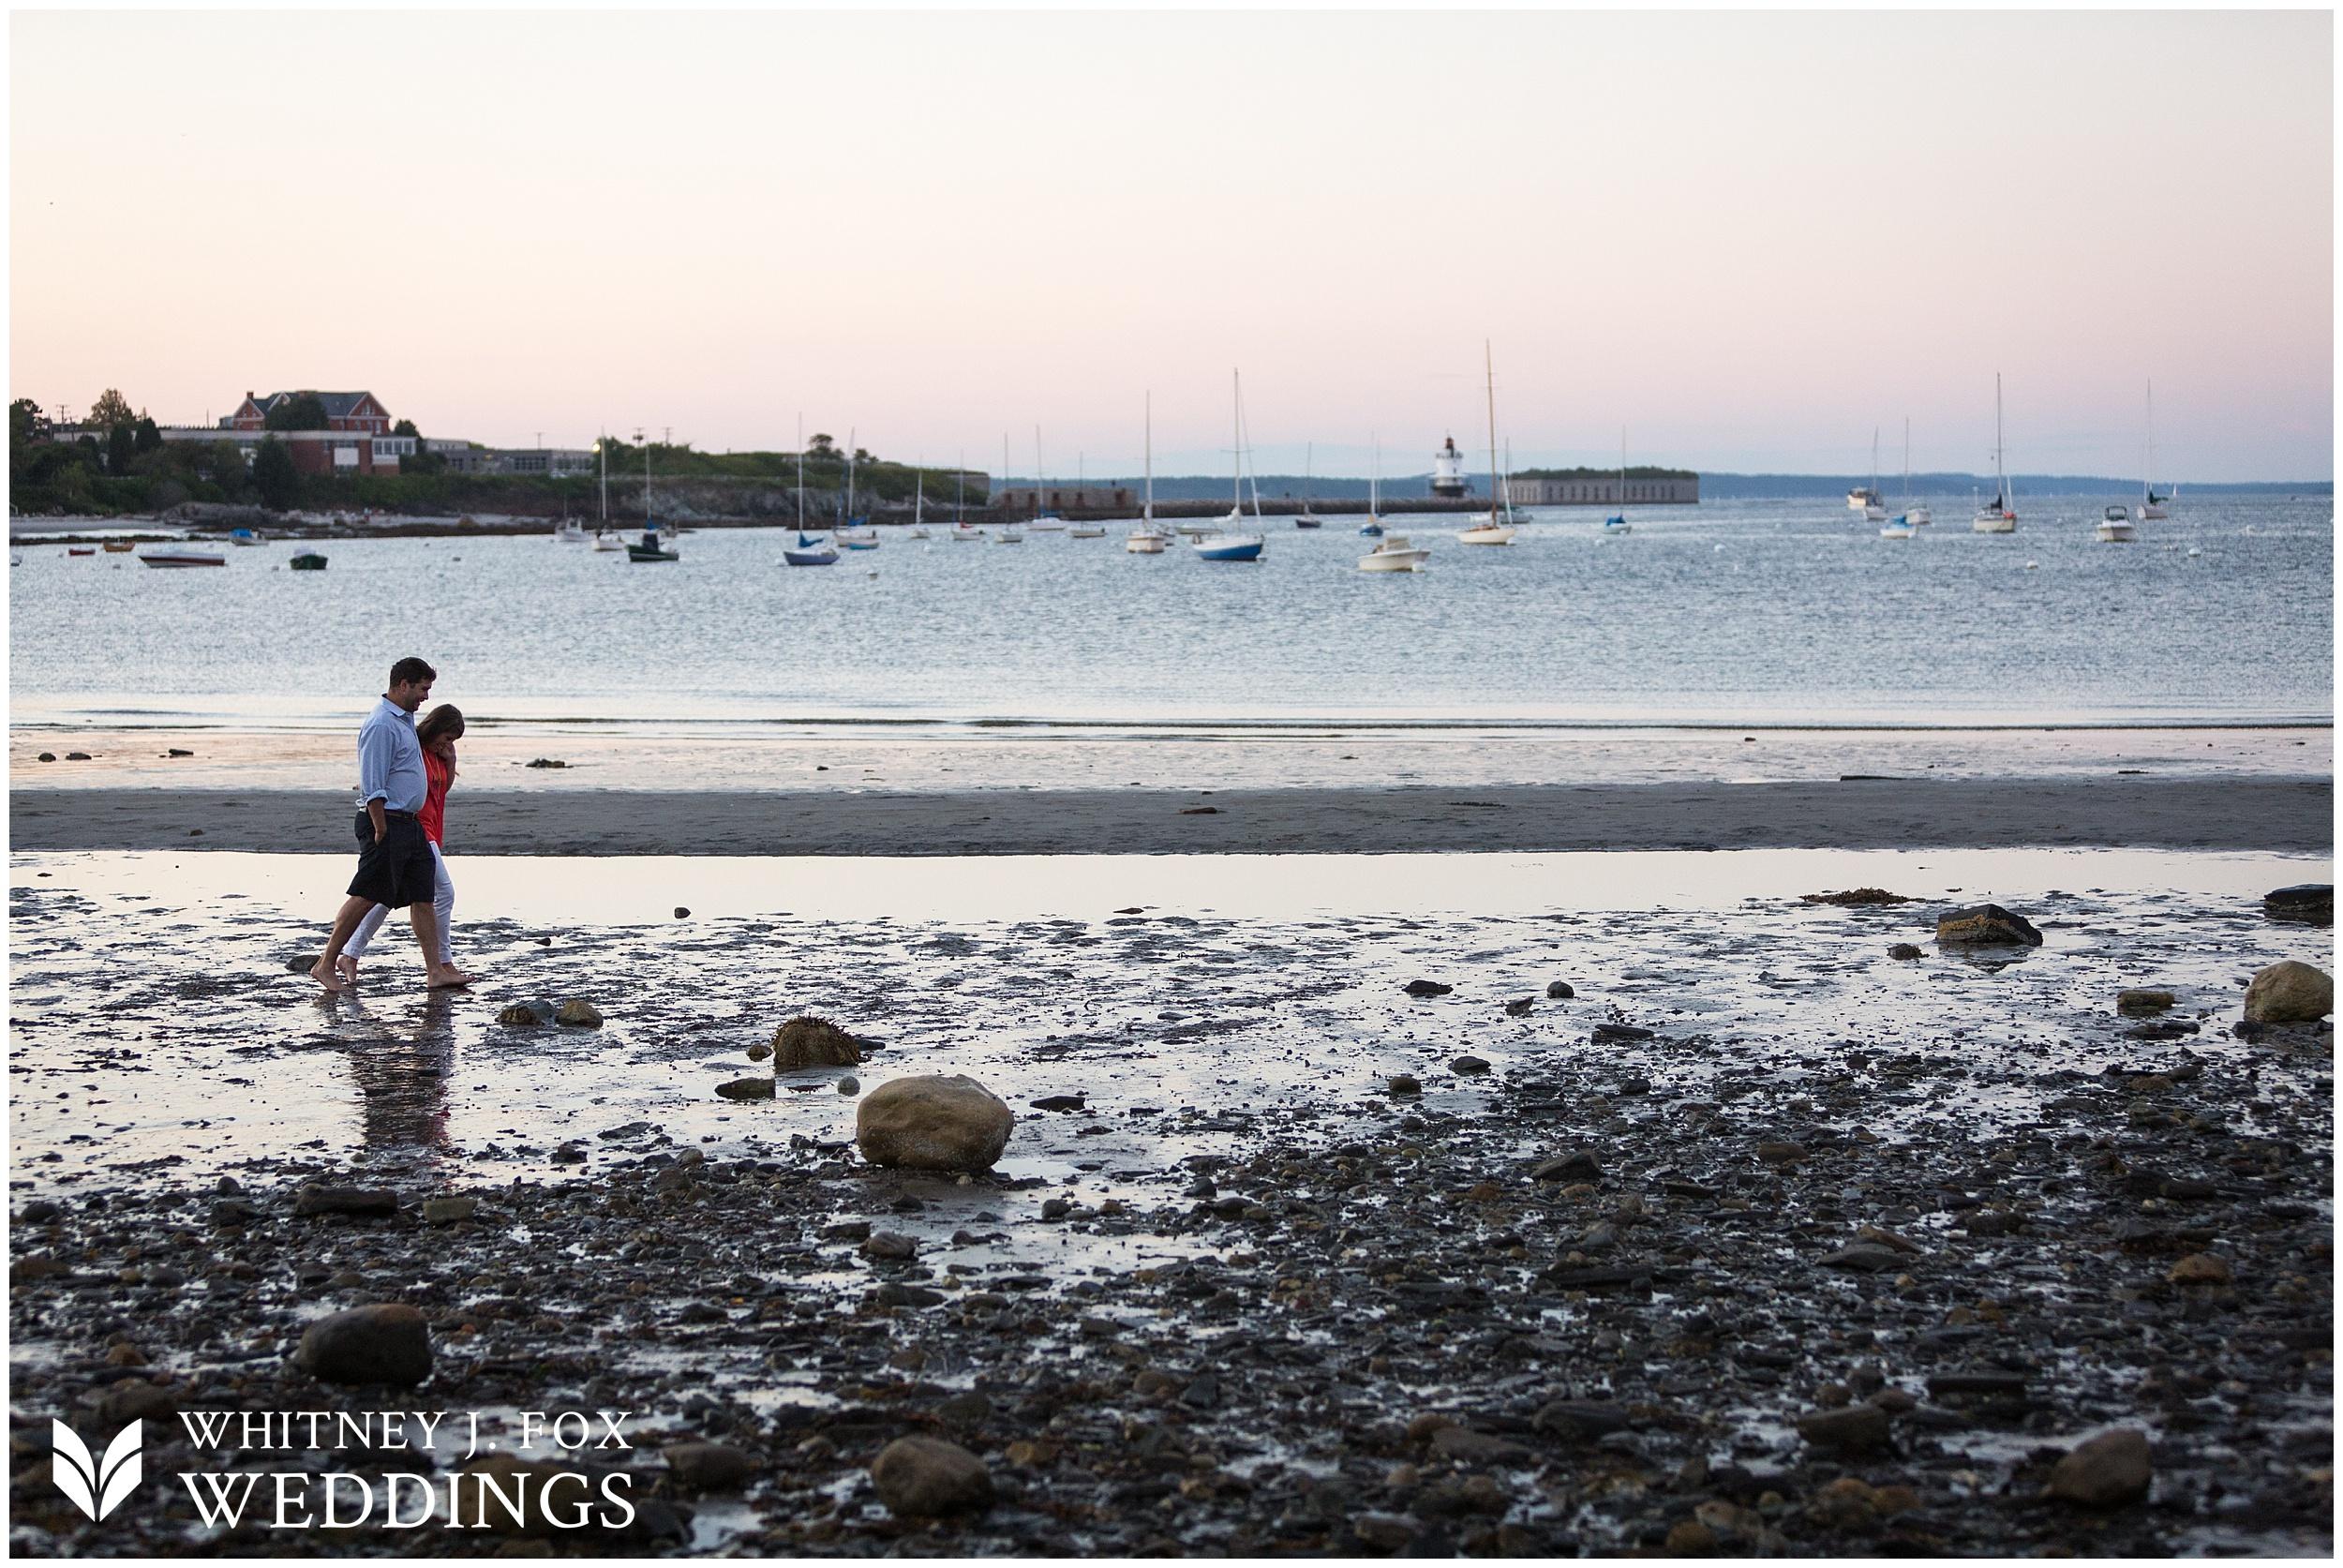 28_274_western_promenade_willard_beach_engagement_session_portland_maine_wedding_photographer_whitney_j_fox_8418.jpg